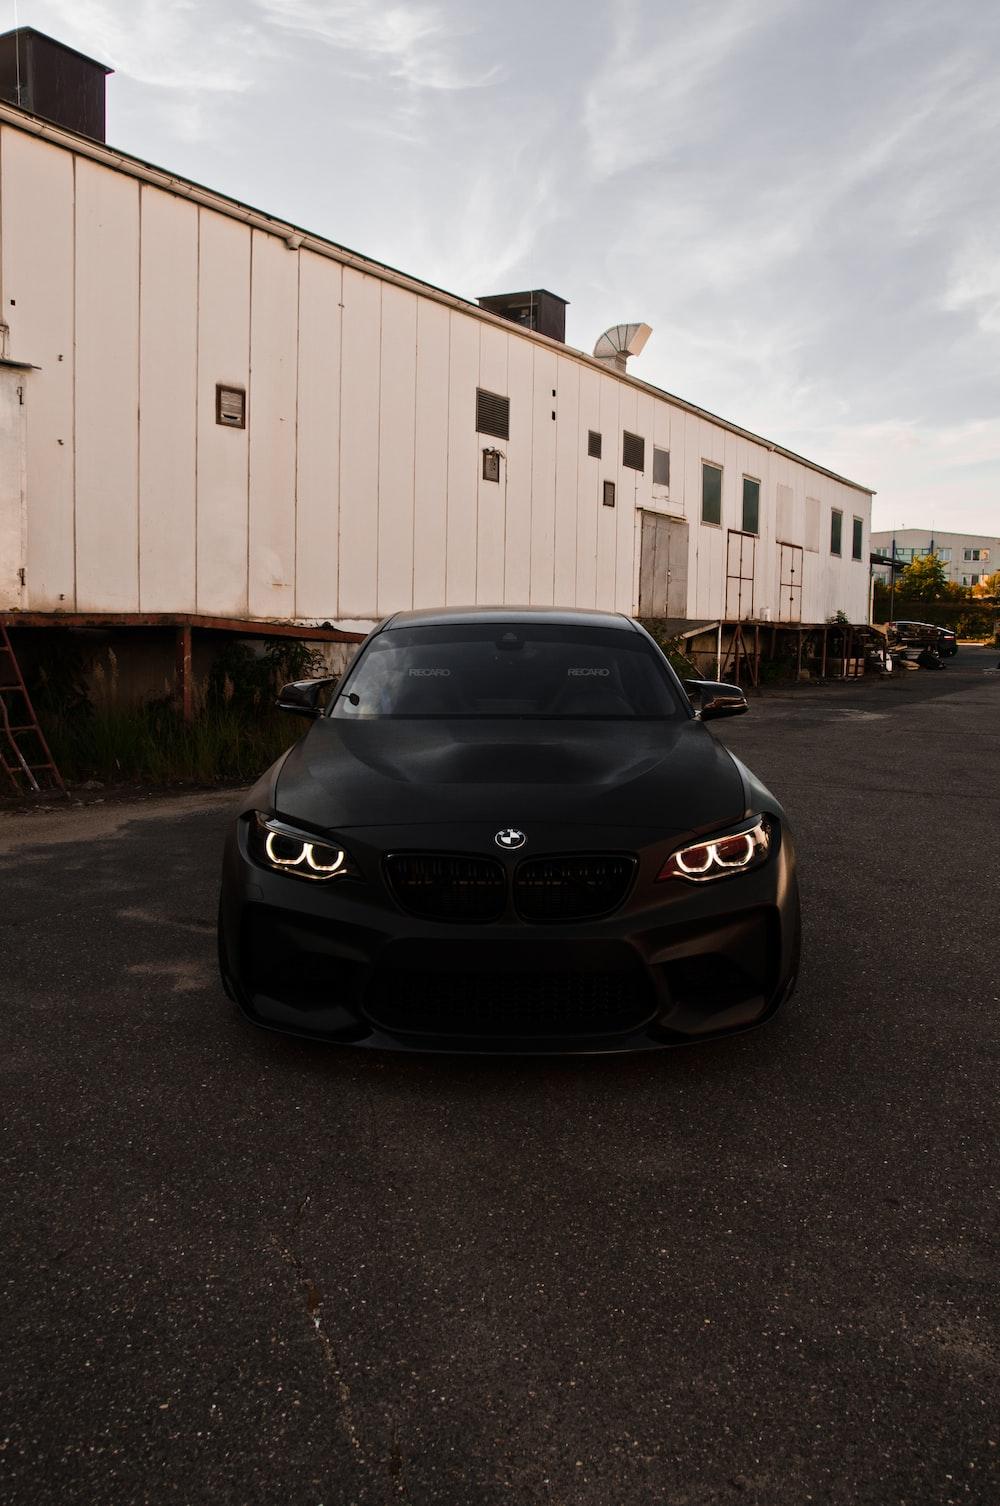 black bmw car parked near white garage during daytime